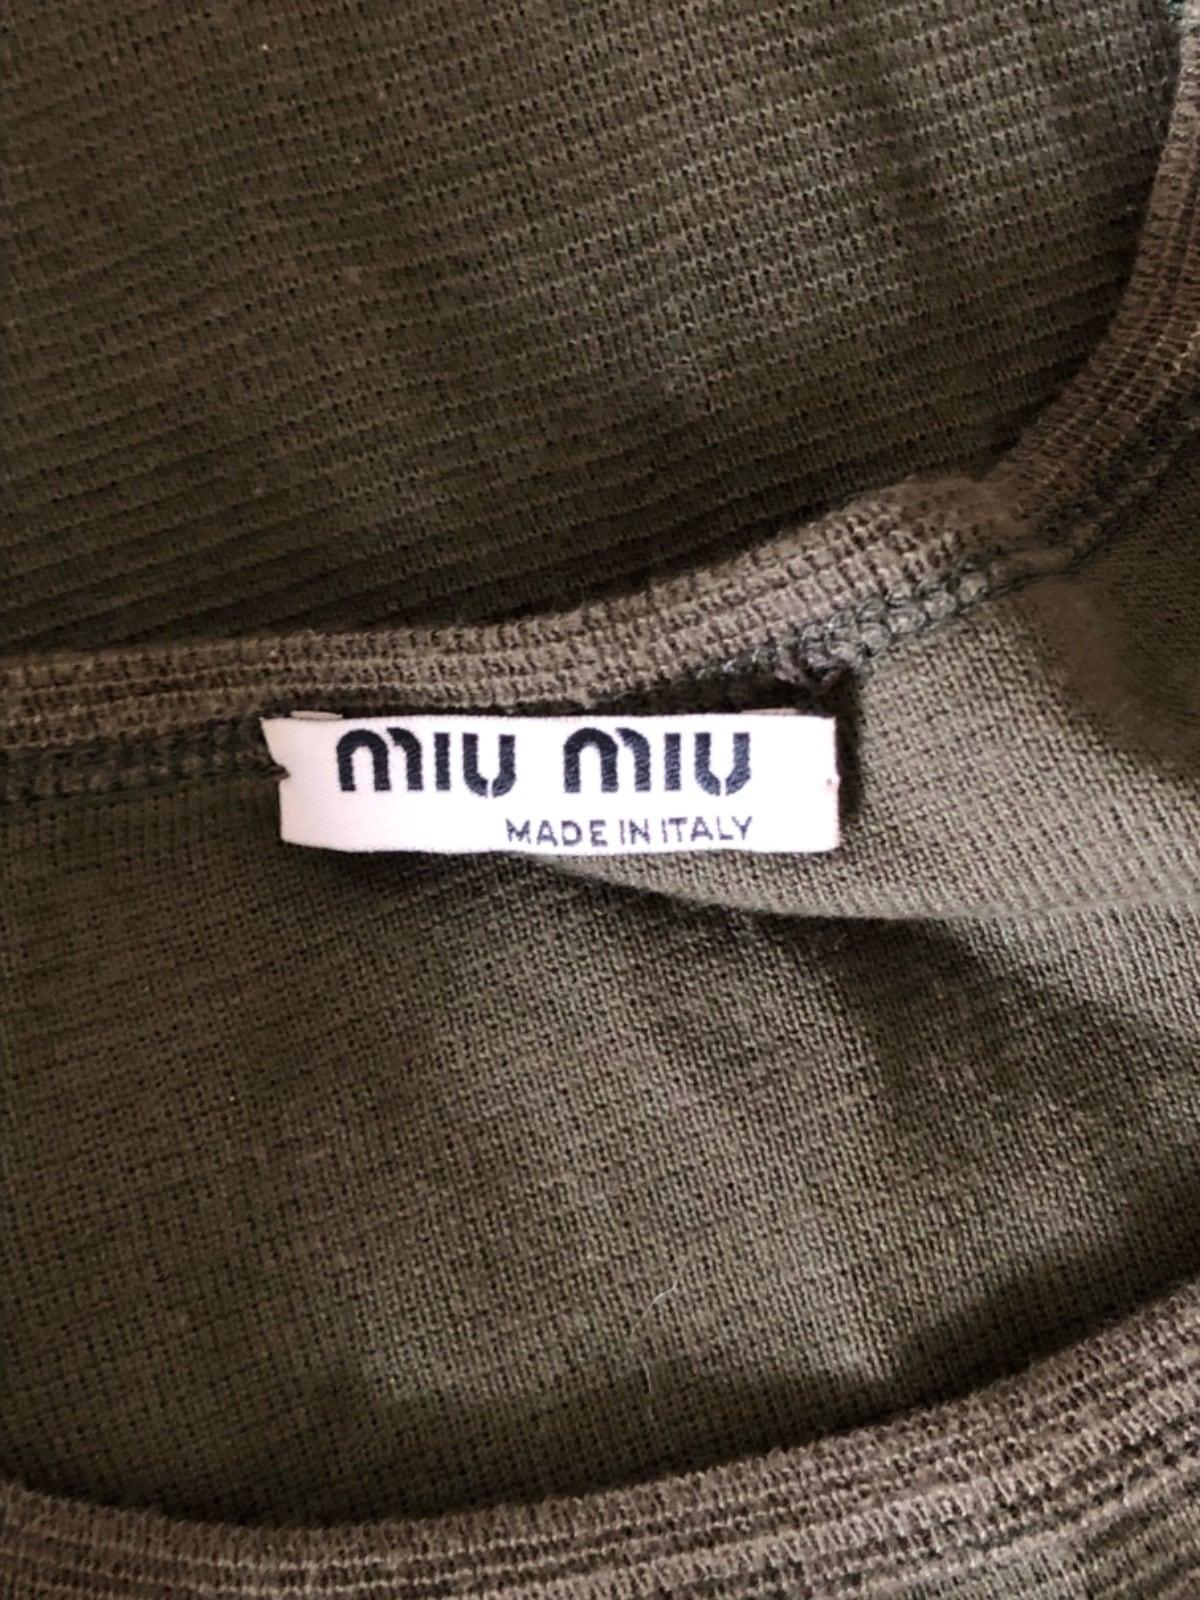 miumiu(ミュウミュウ)のカットソー